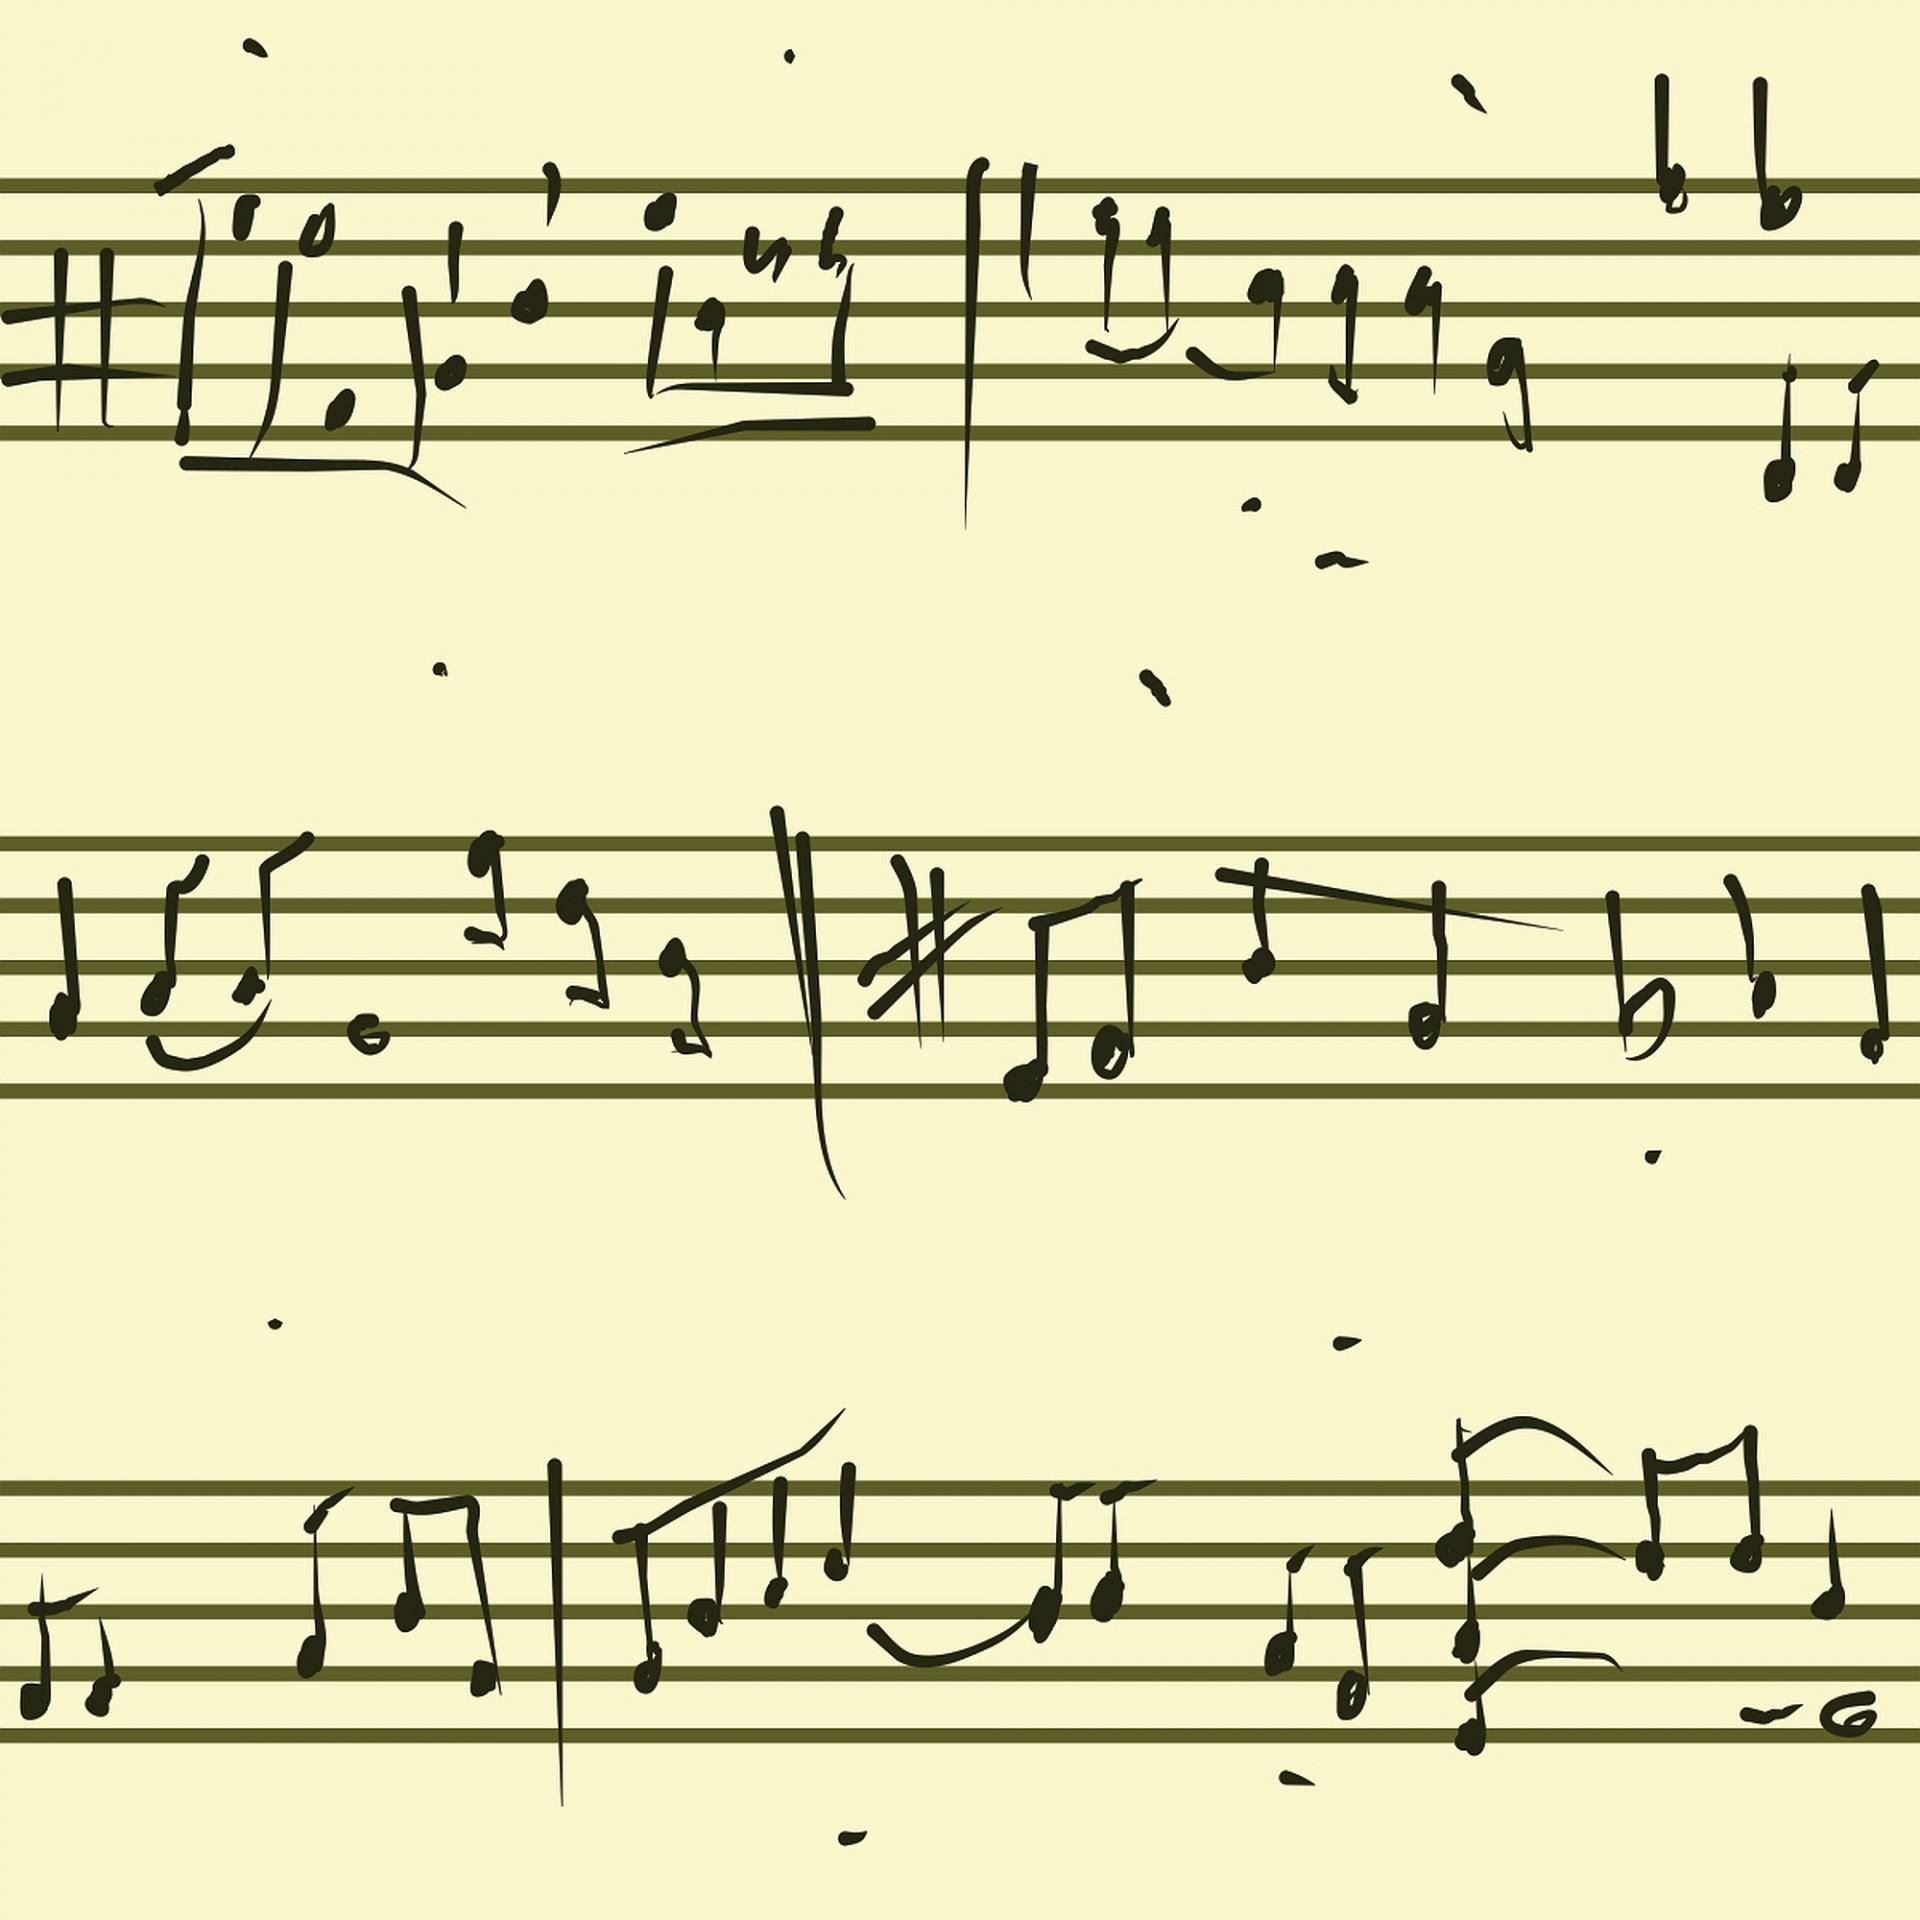 music-notes-2.jpg